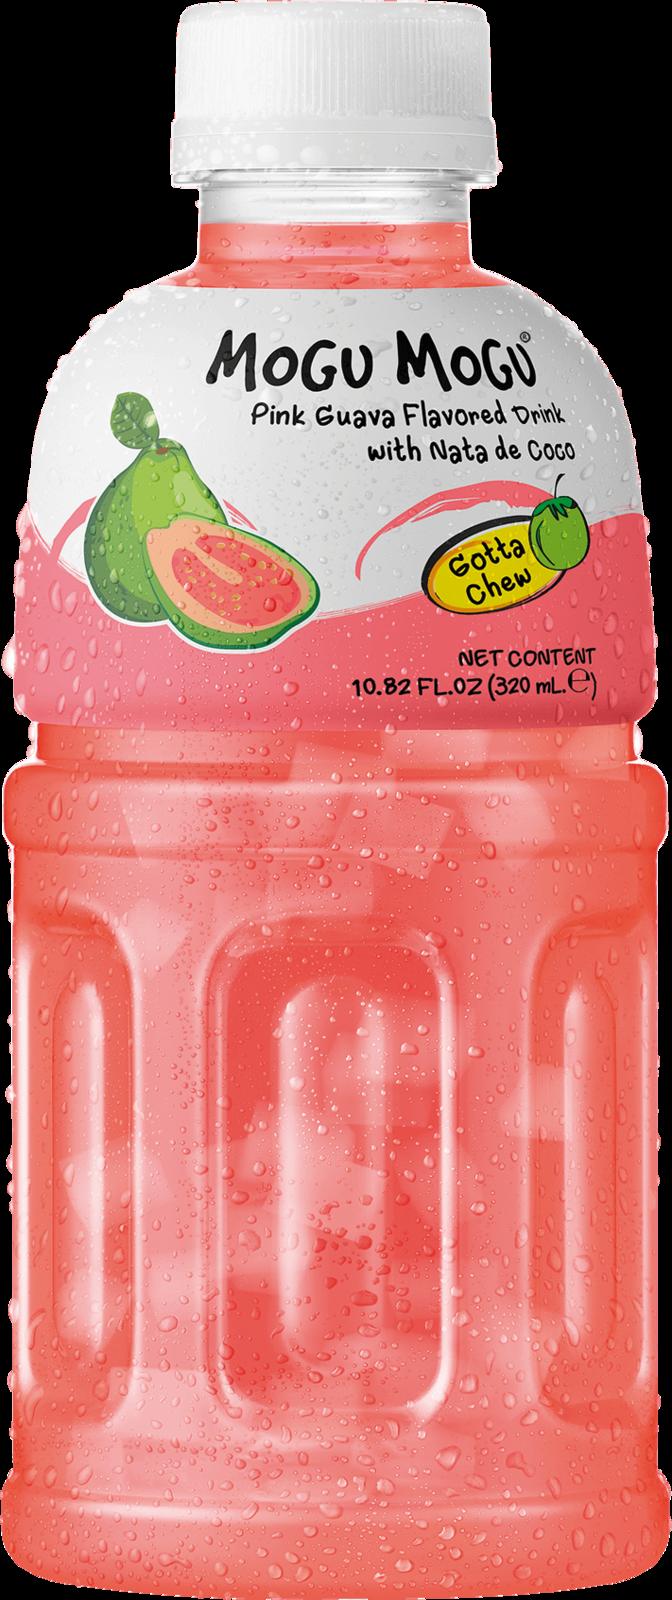 Mogu Mogu: Pink Guava Flavored Drink 320ml image